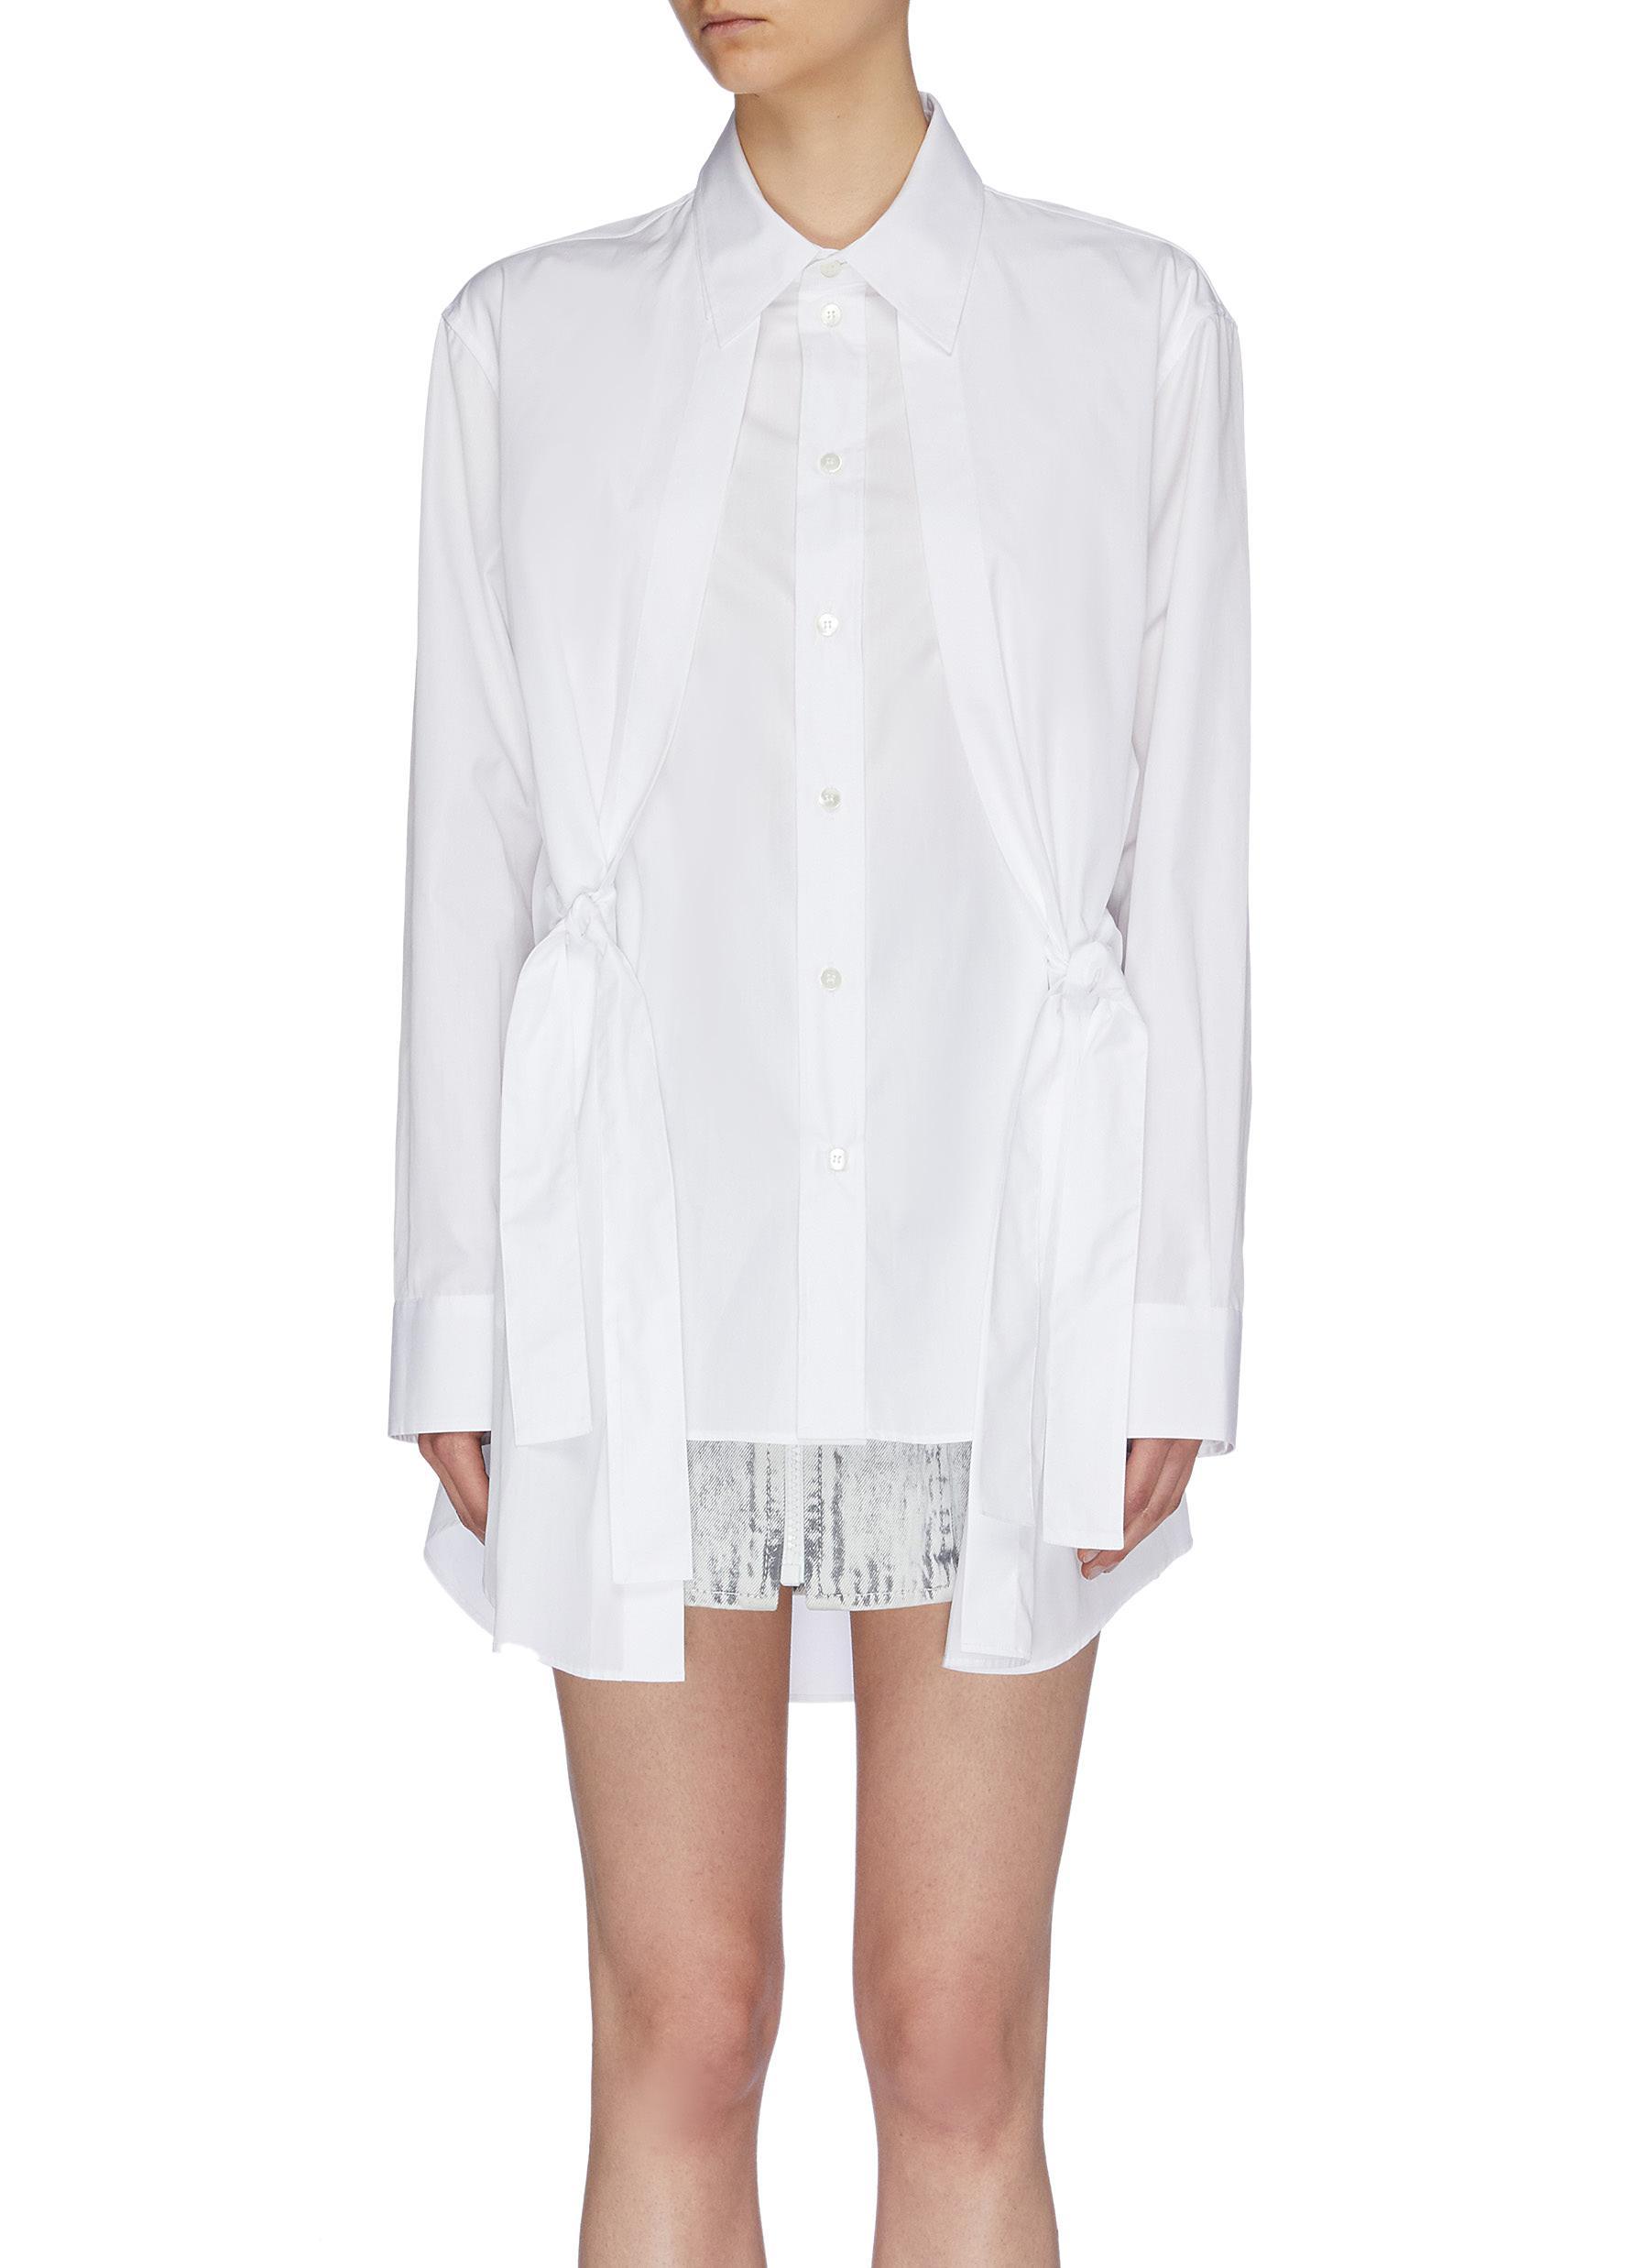 Knotted layered panel shirt by Maison Margiela